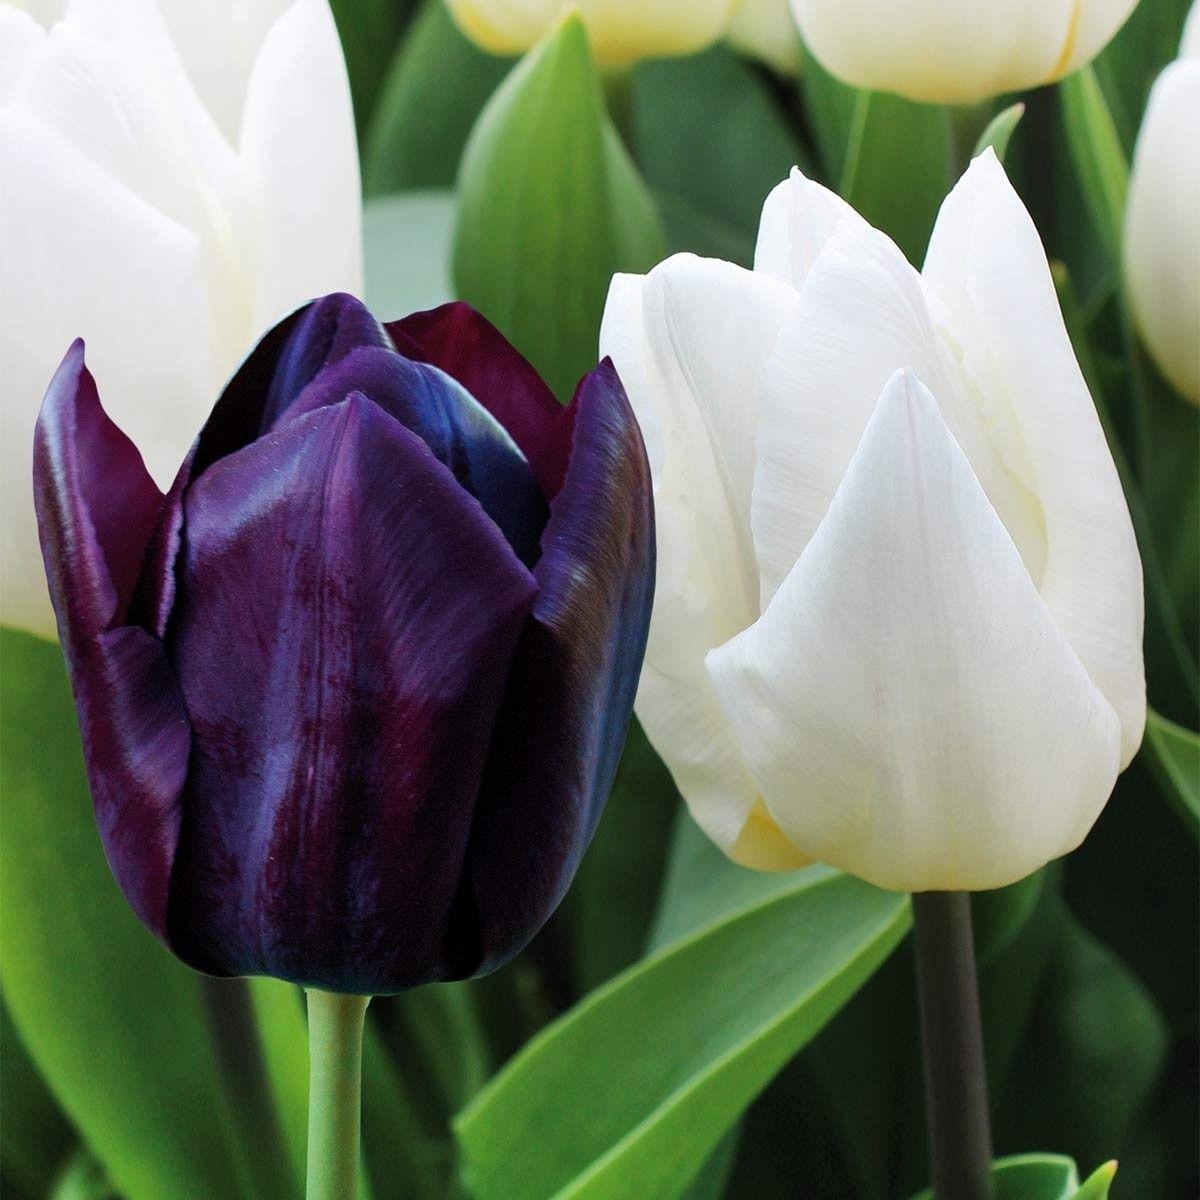 Tulpen Mischung Fruhlingsgarten Schwarz Auf Weiss Fein Aufeinander Abgestimmte Farbmischung Von Weissen Und Dunkelviolette Fruhlingsgarten Fruhling Tom Garten